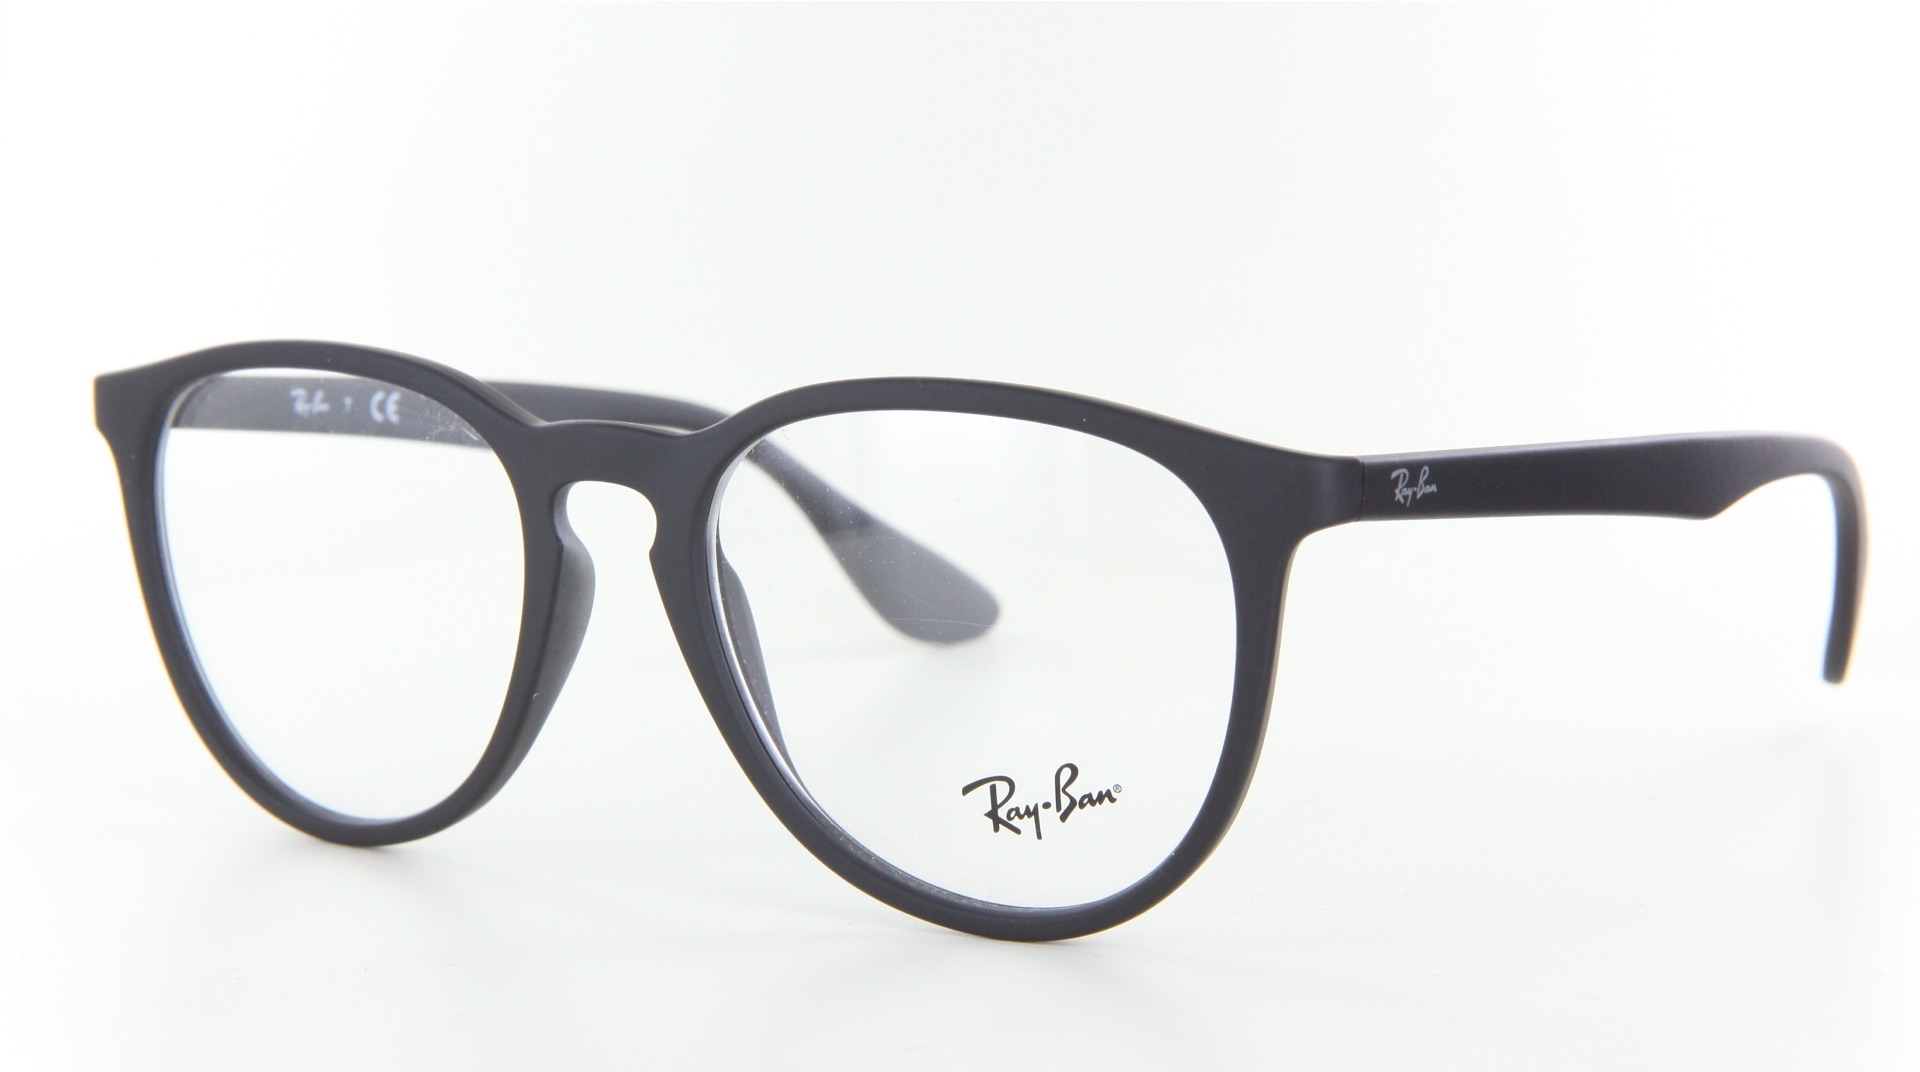 Ray-Ban - ref: 72939